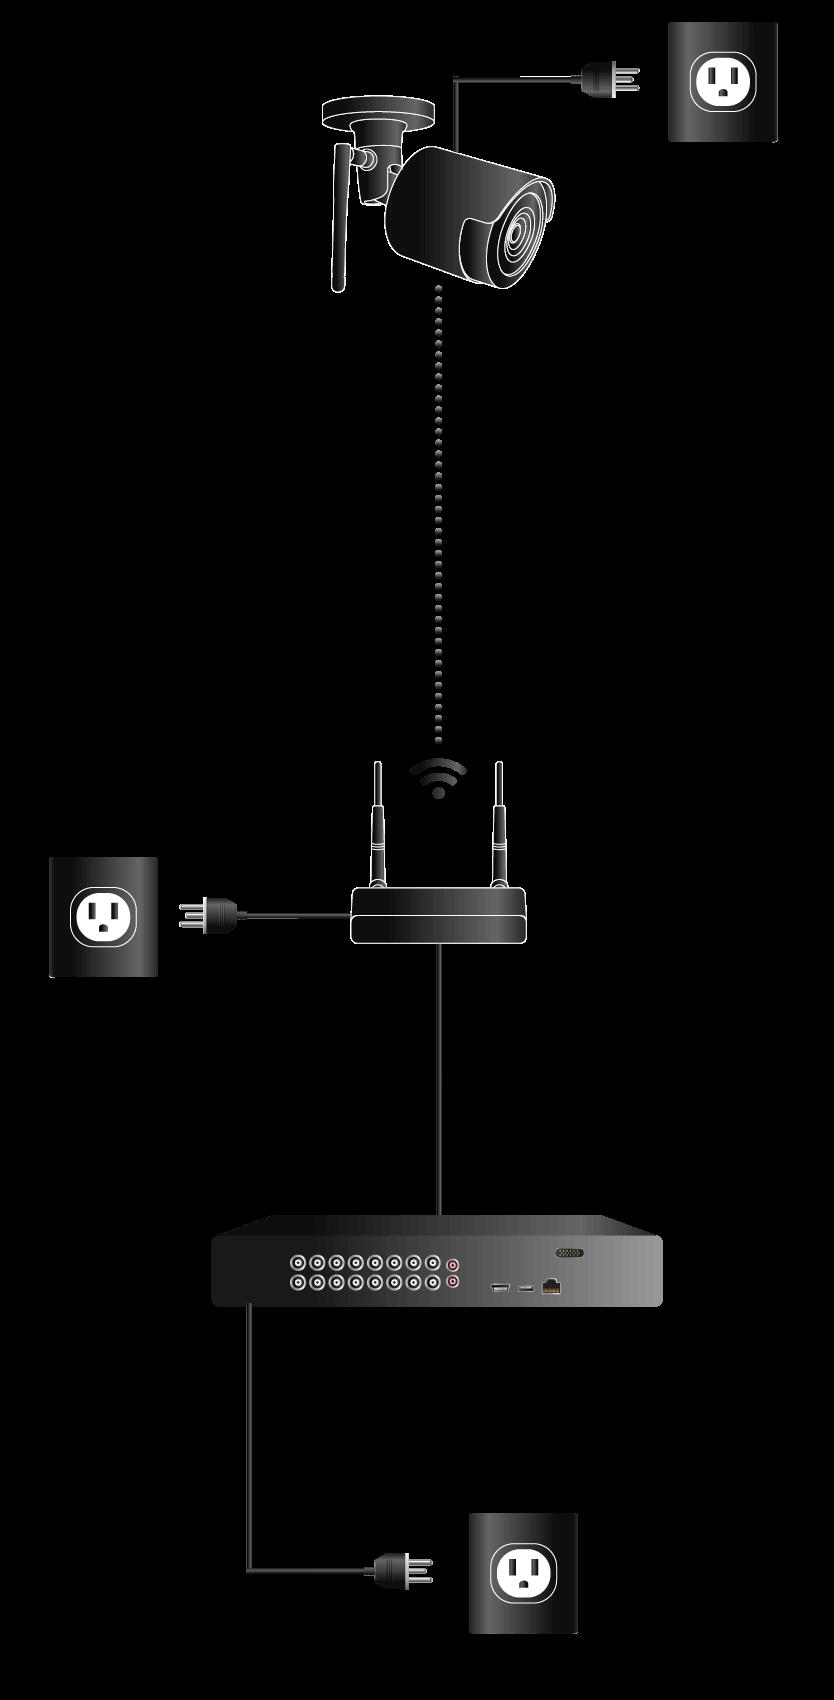 Security Camera Wiring Diagram : security, camera, wiring, diagram, Install, Security, Cameras